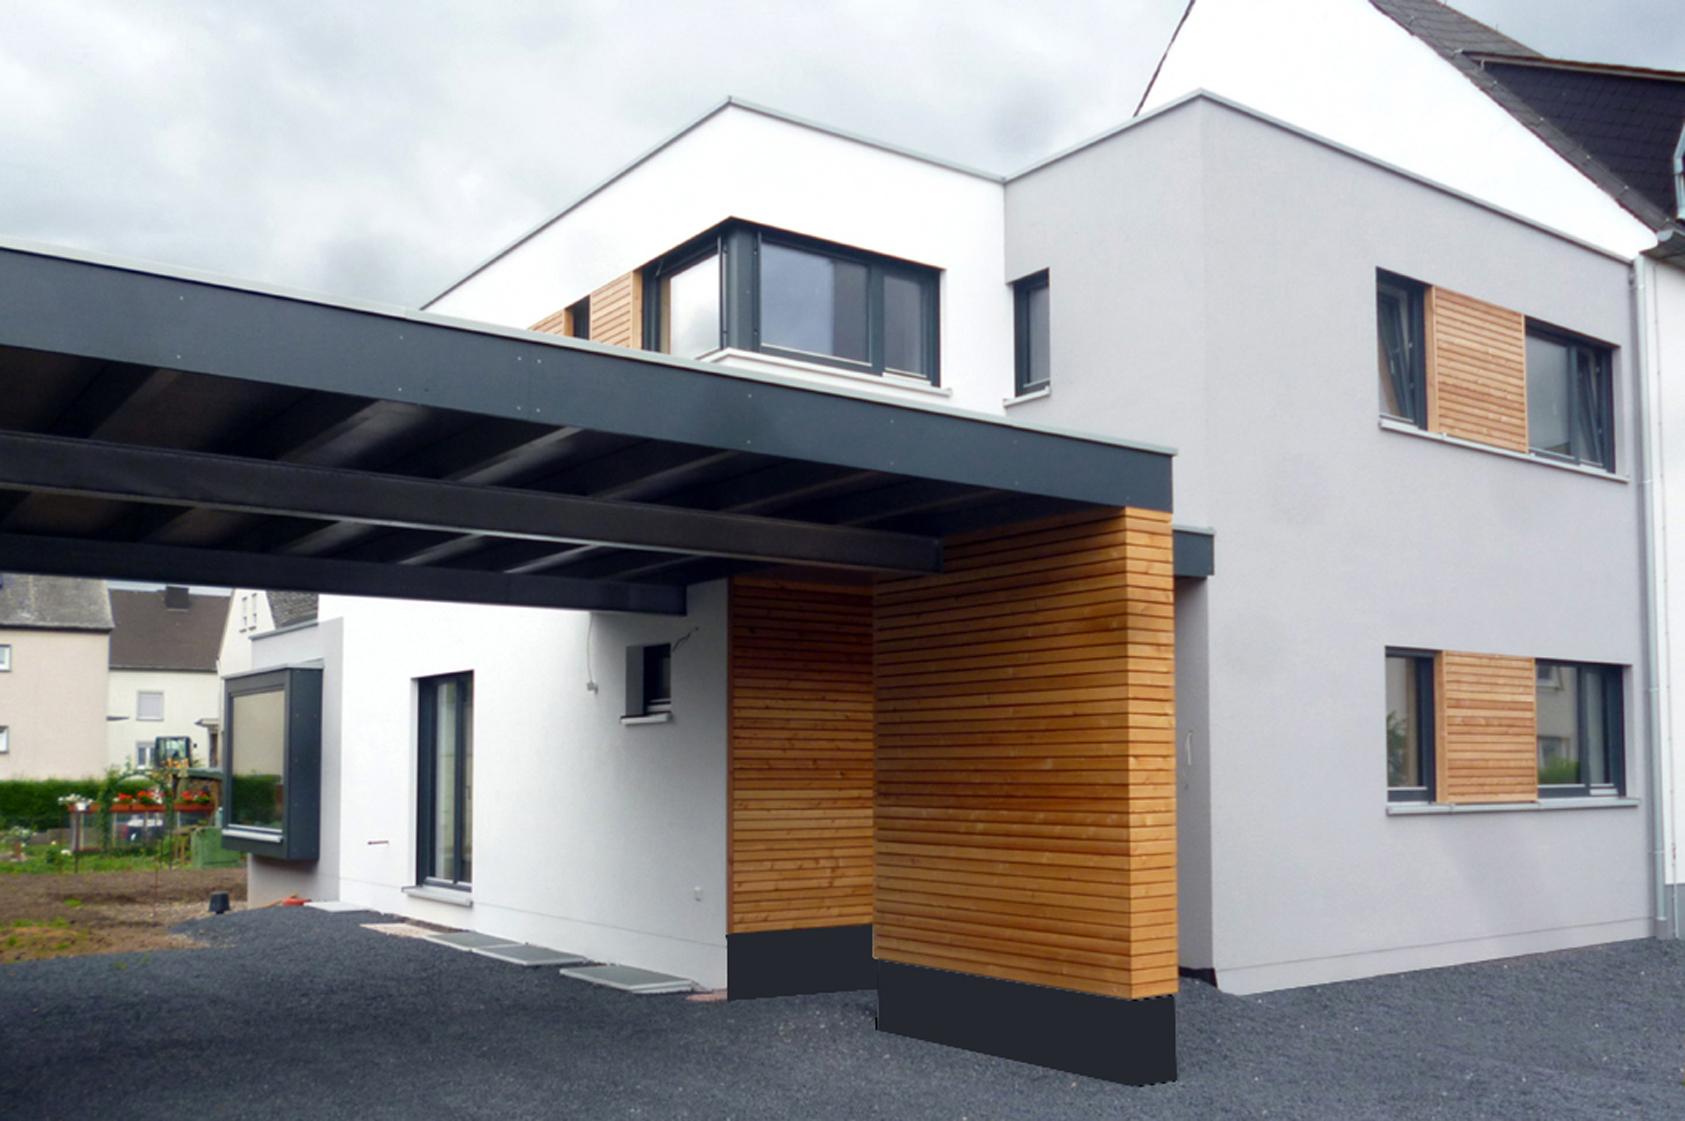 anbau einfamilienholzhaus modern umgesetzt der holzbau schweiz. Black Bedroom Furniture Sets. Home Design Ideas